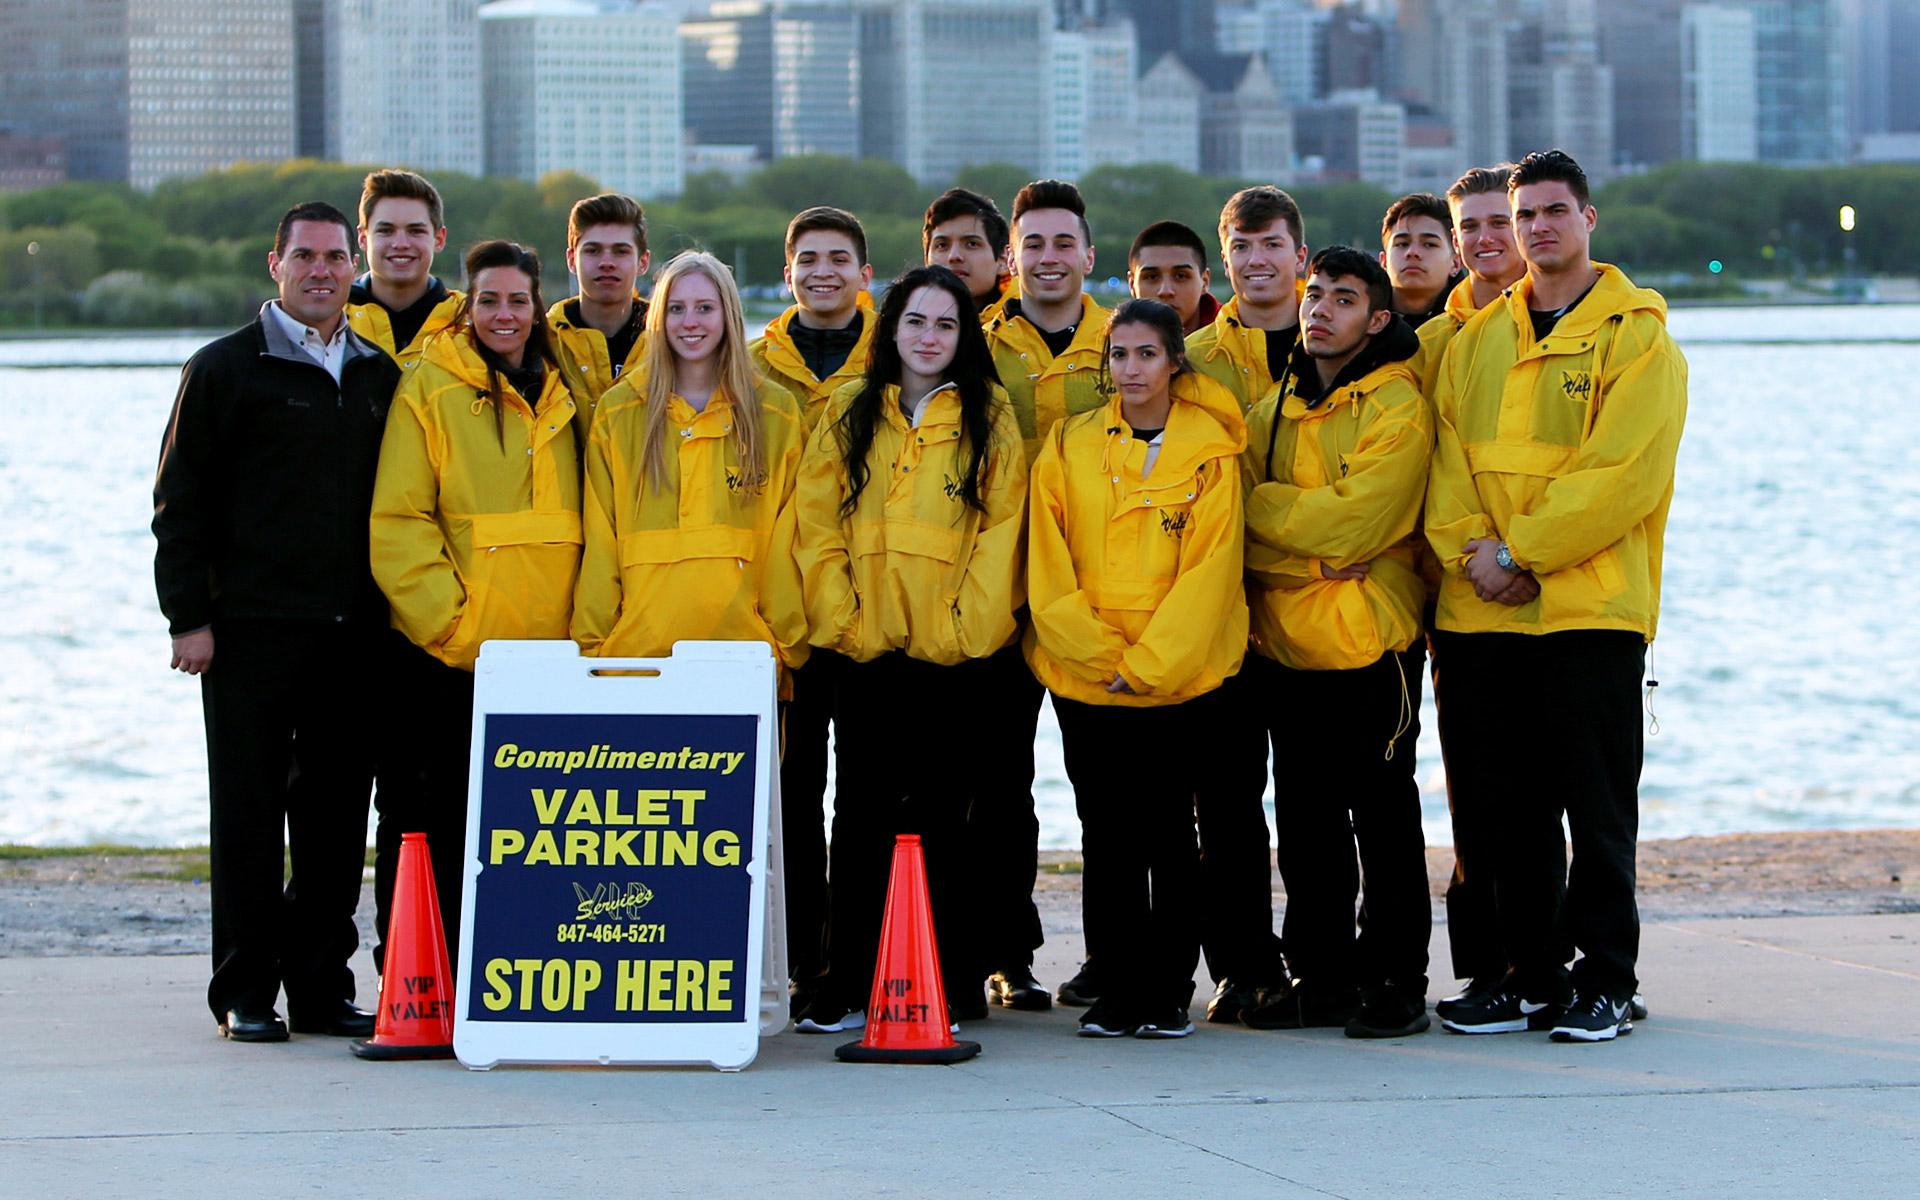 V.I.P. Valet Services